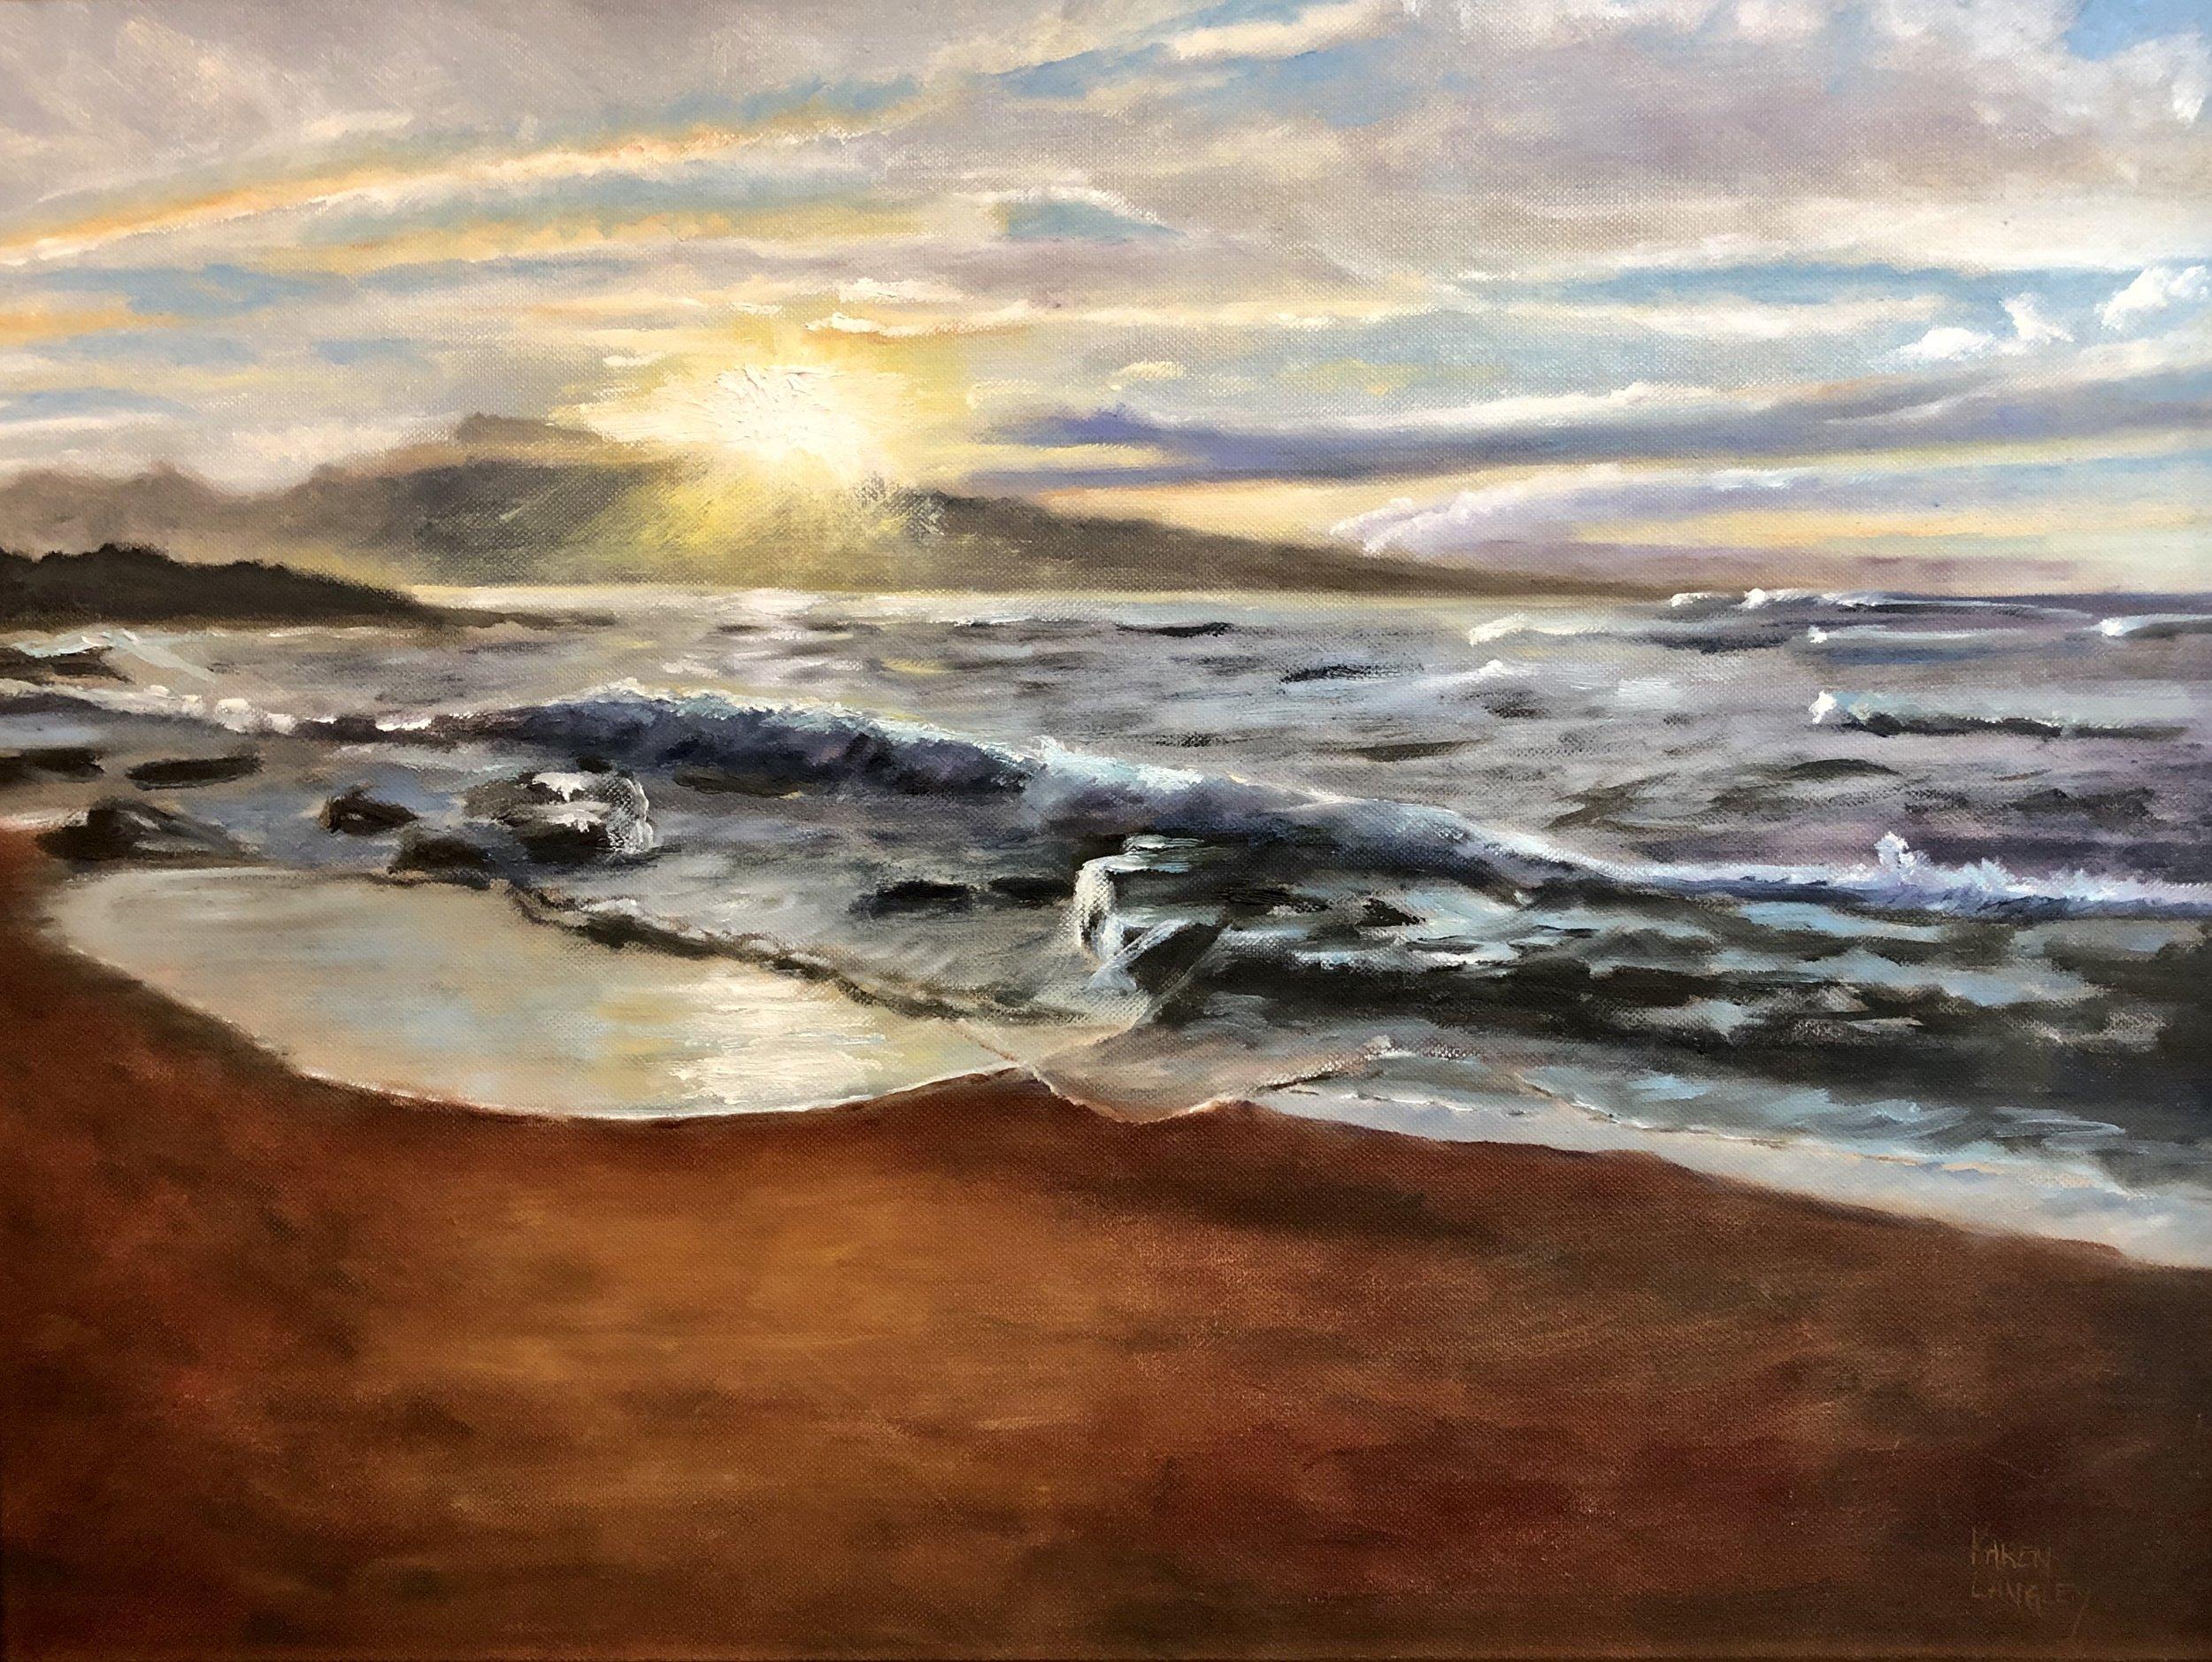 Maui Sunset  Oil on Canvas 16x20